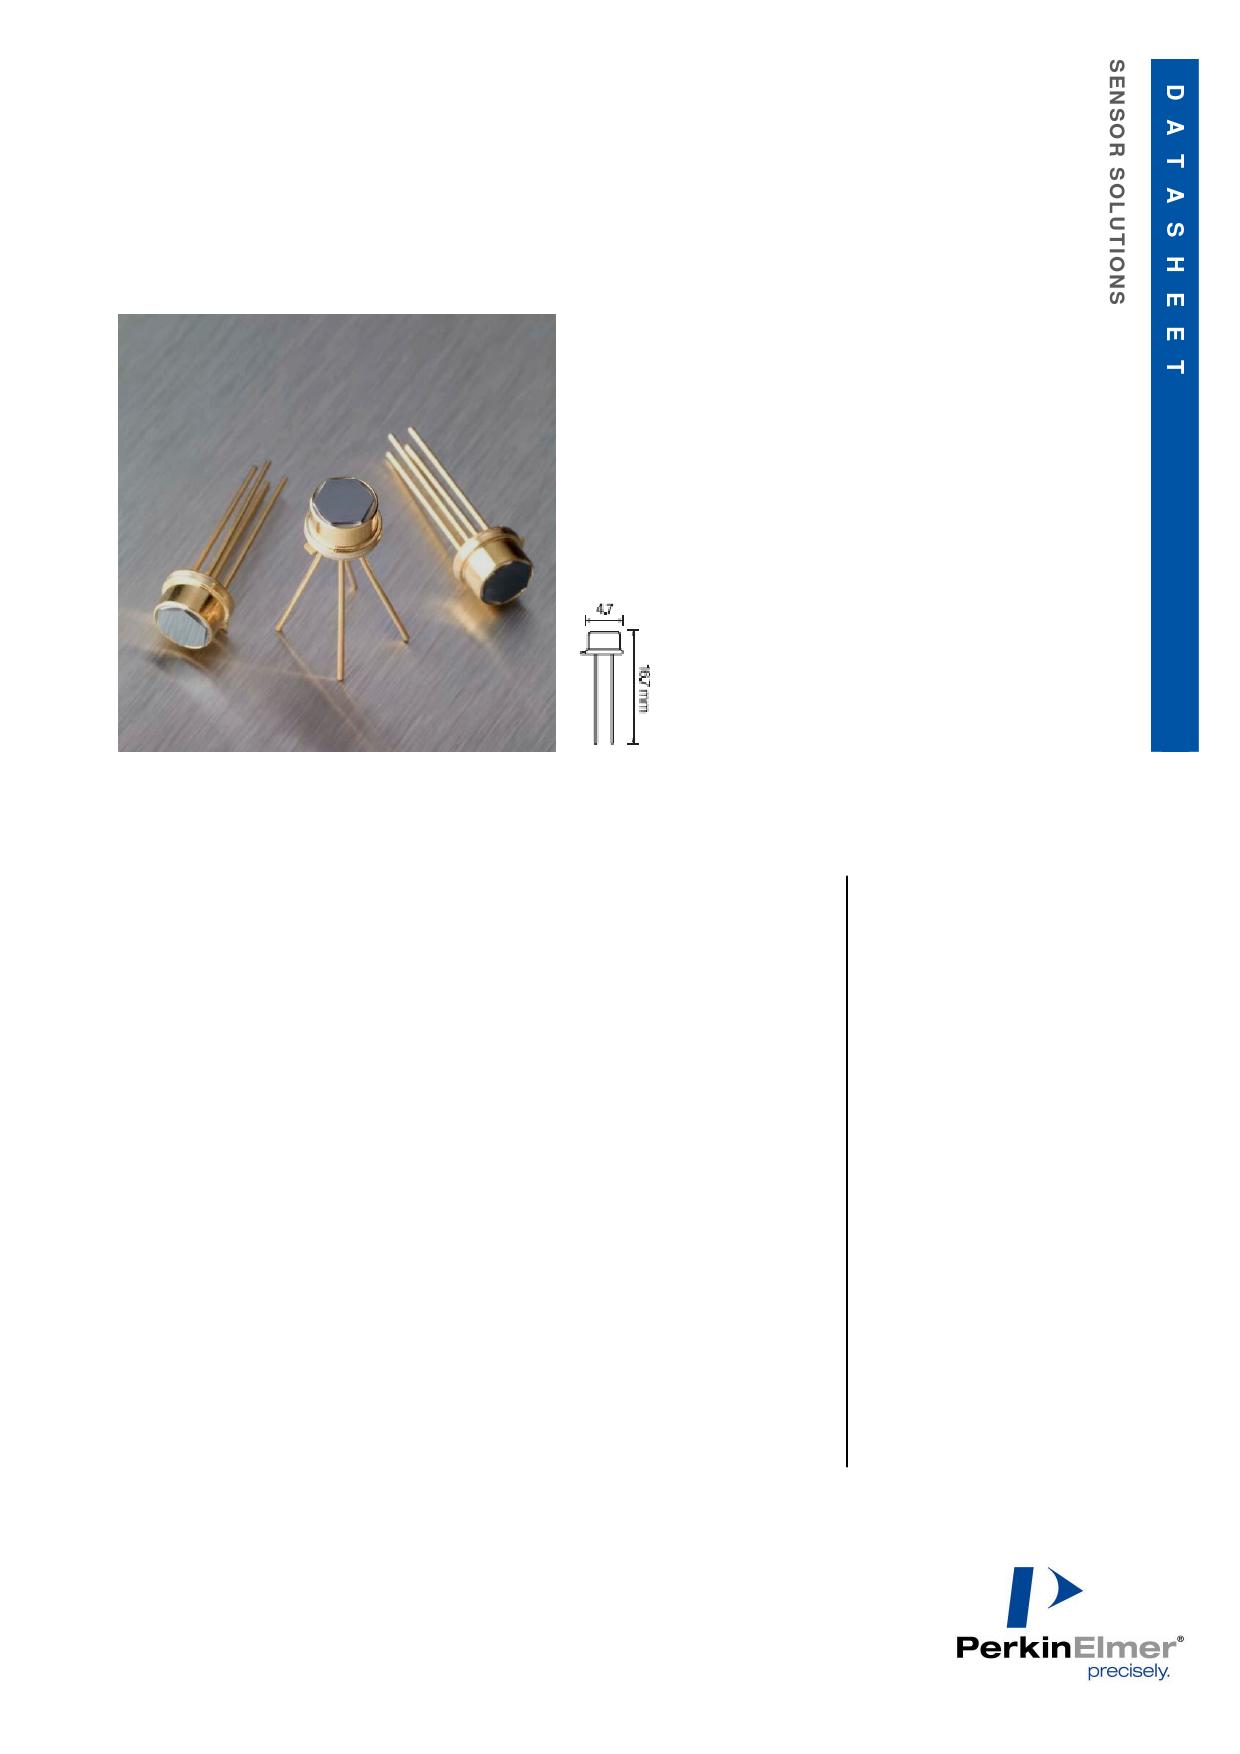 TPS3367 datasheet